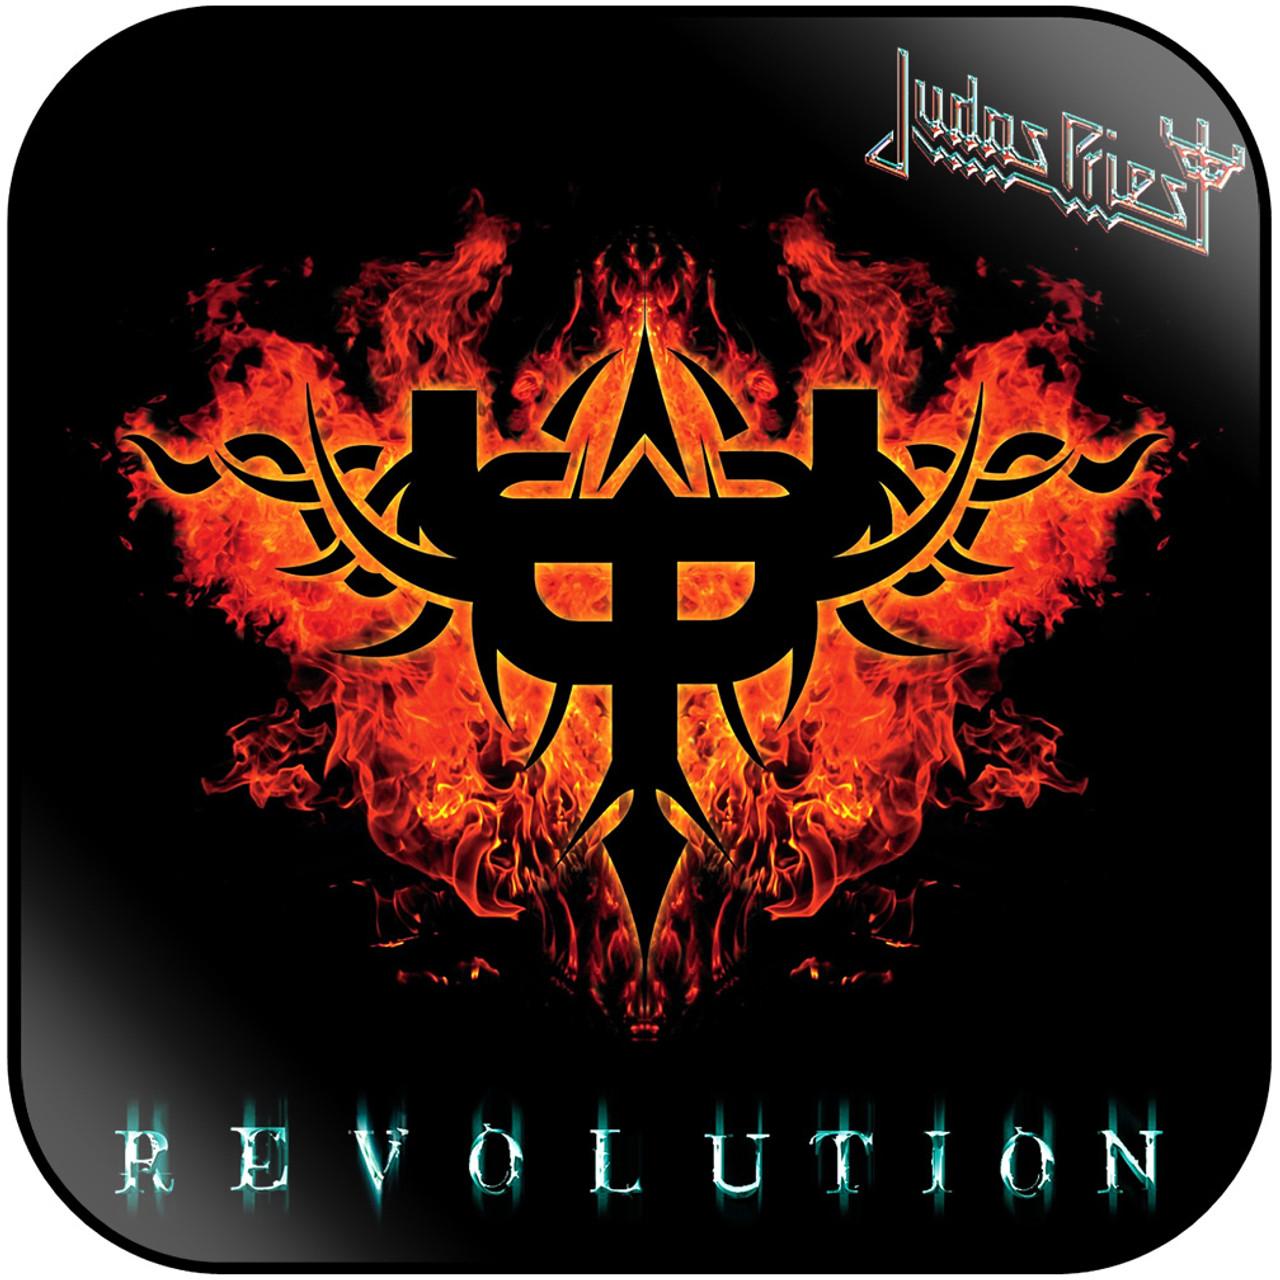 https://cdn11.bigcommerce.com/s-8e25iavqdi/images/stencil/1280x1280/products/44986/44125/revolution-album-cover-sticker__34621.1539964076.jpg?c=2&imbypass=on